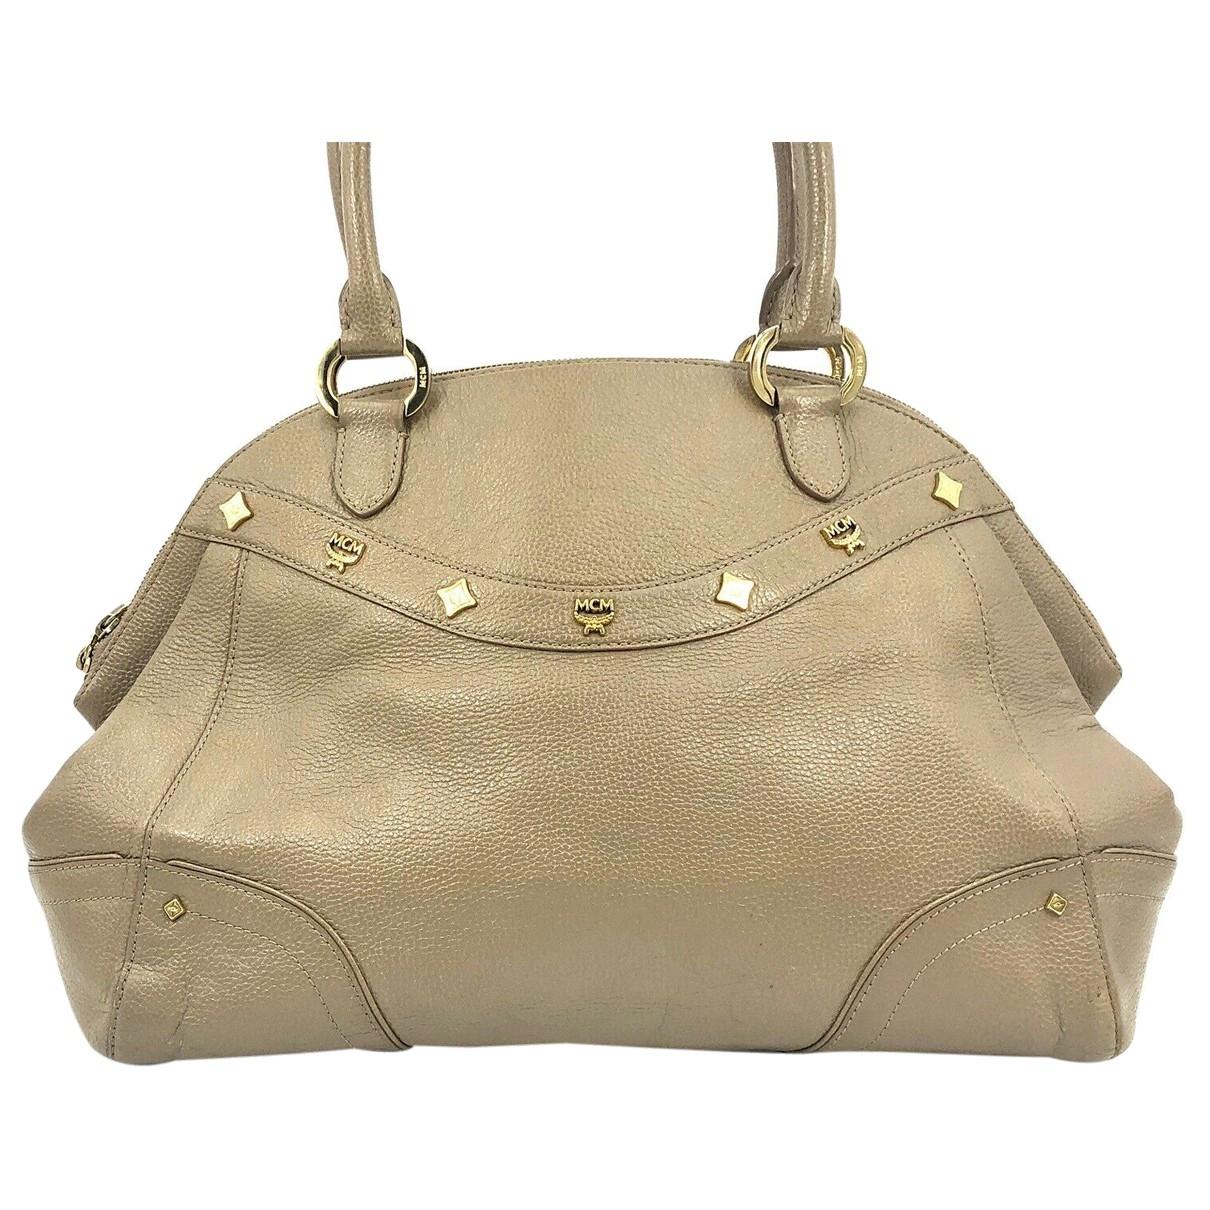 Mcm \N Handtasche in  Beige Leder